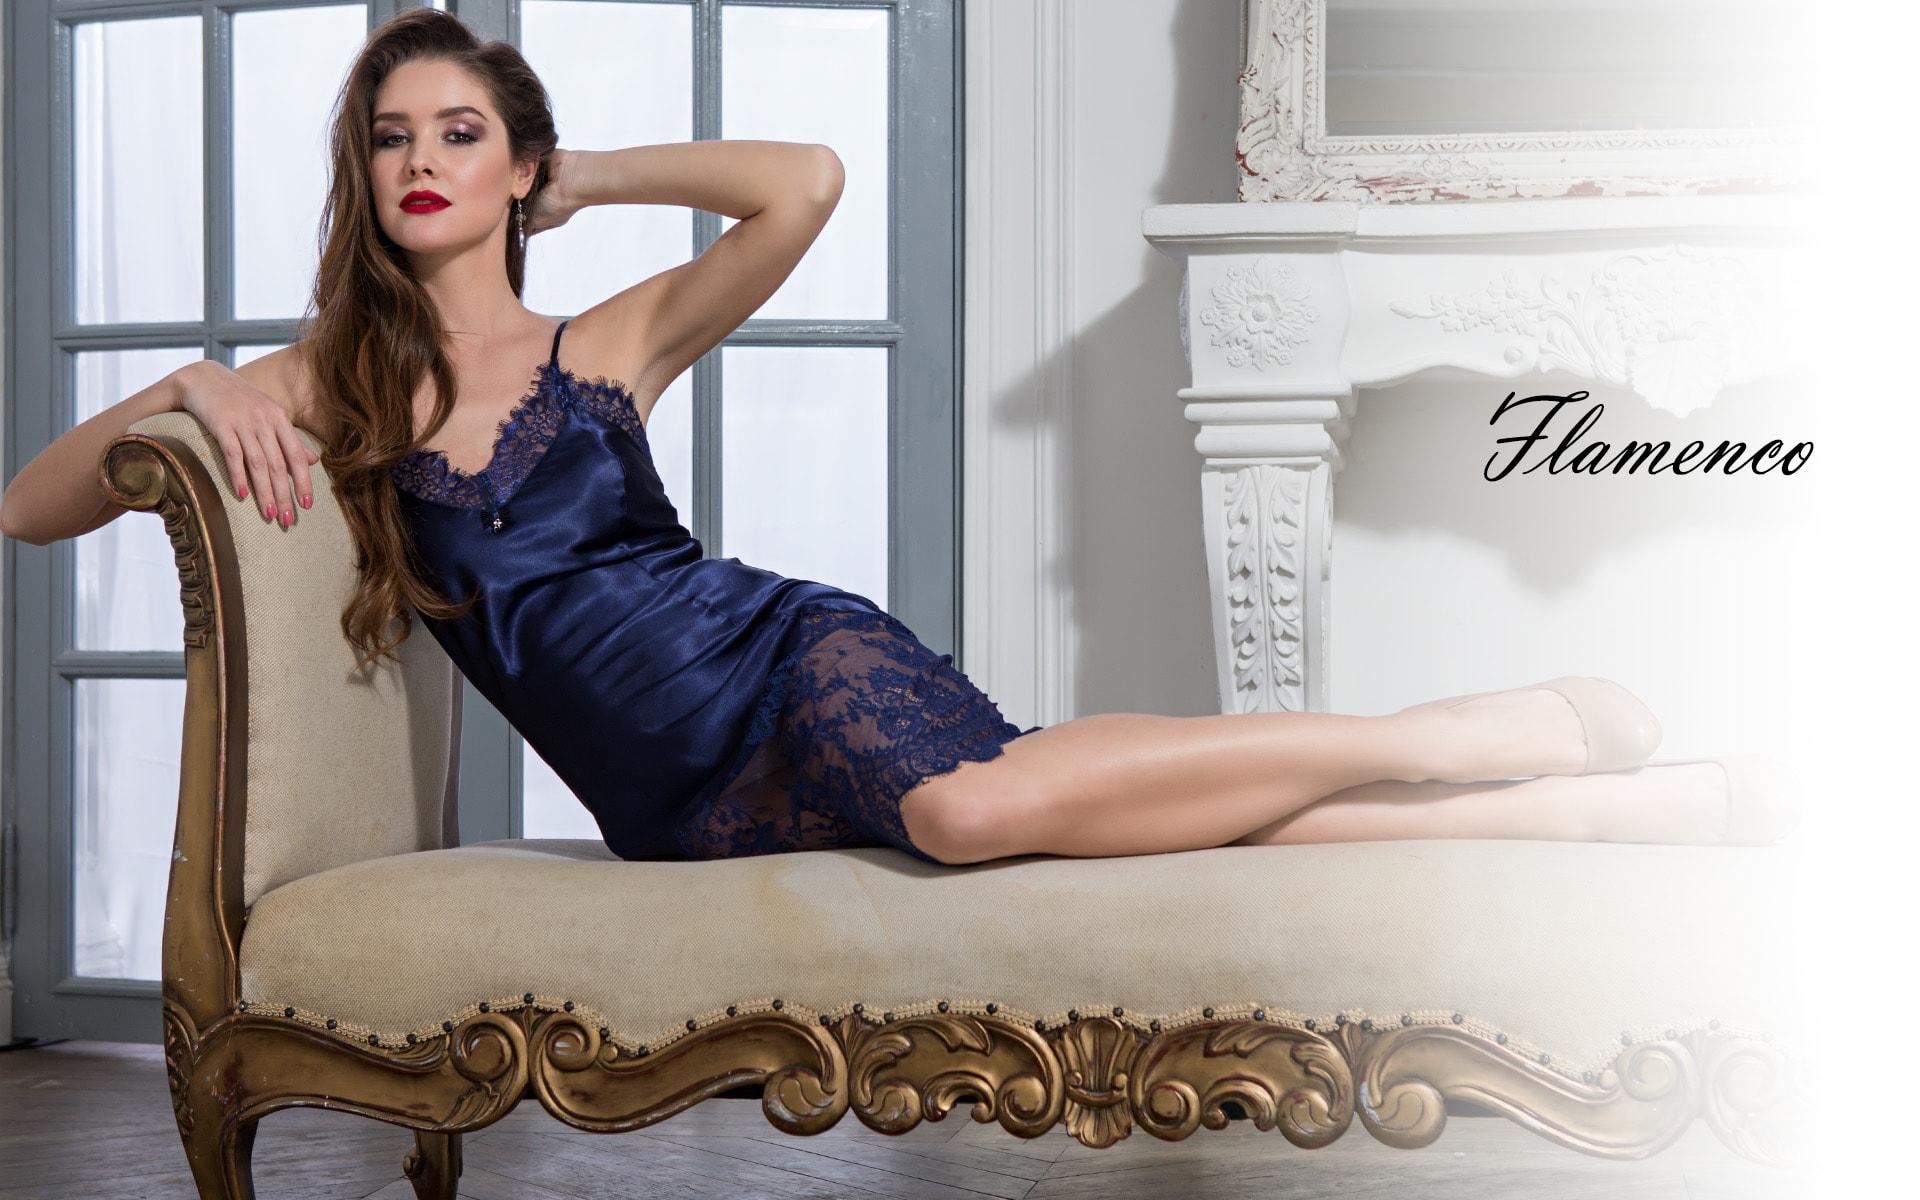 Коллекция Flamenco Mia-Mia шелк Италия купить Киев